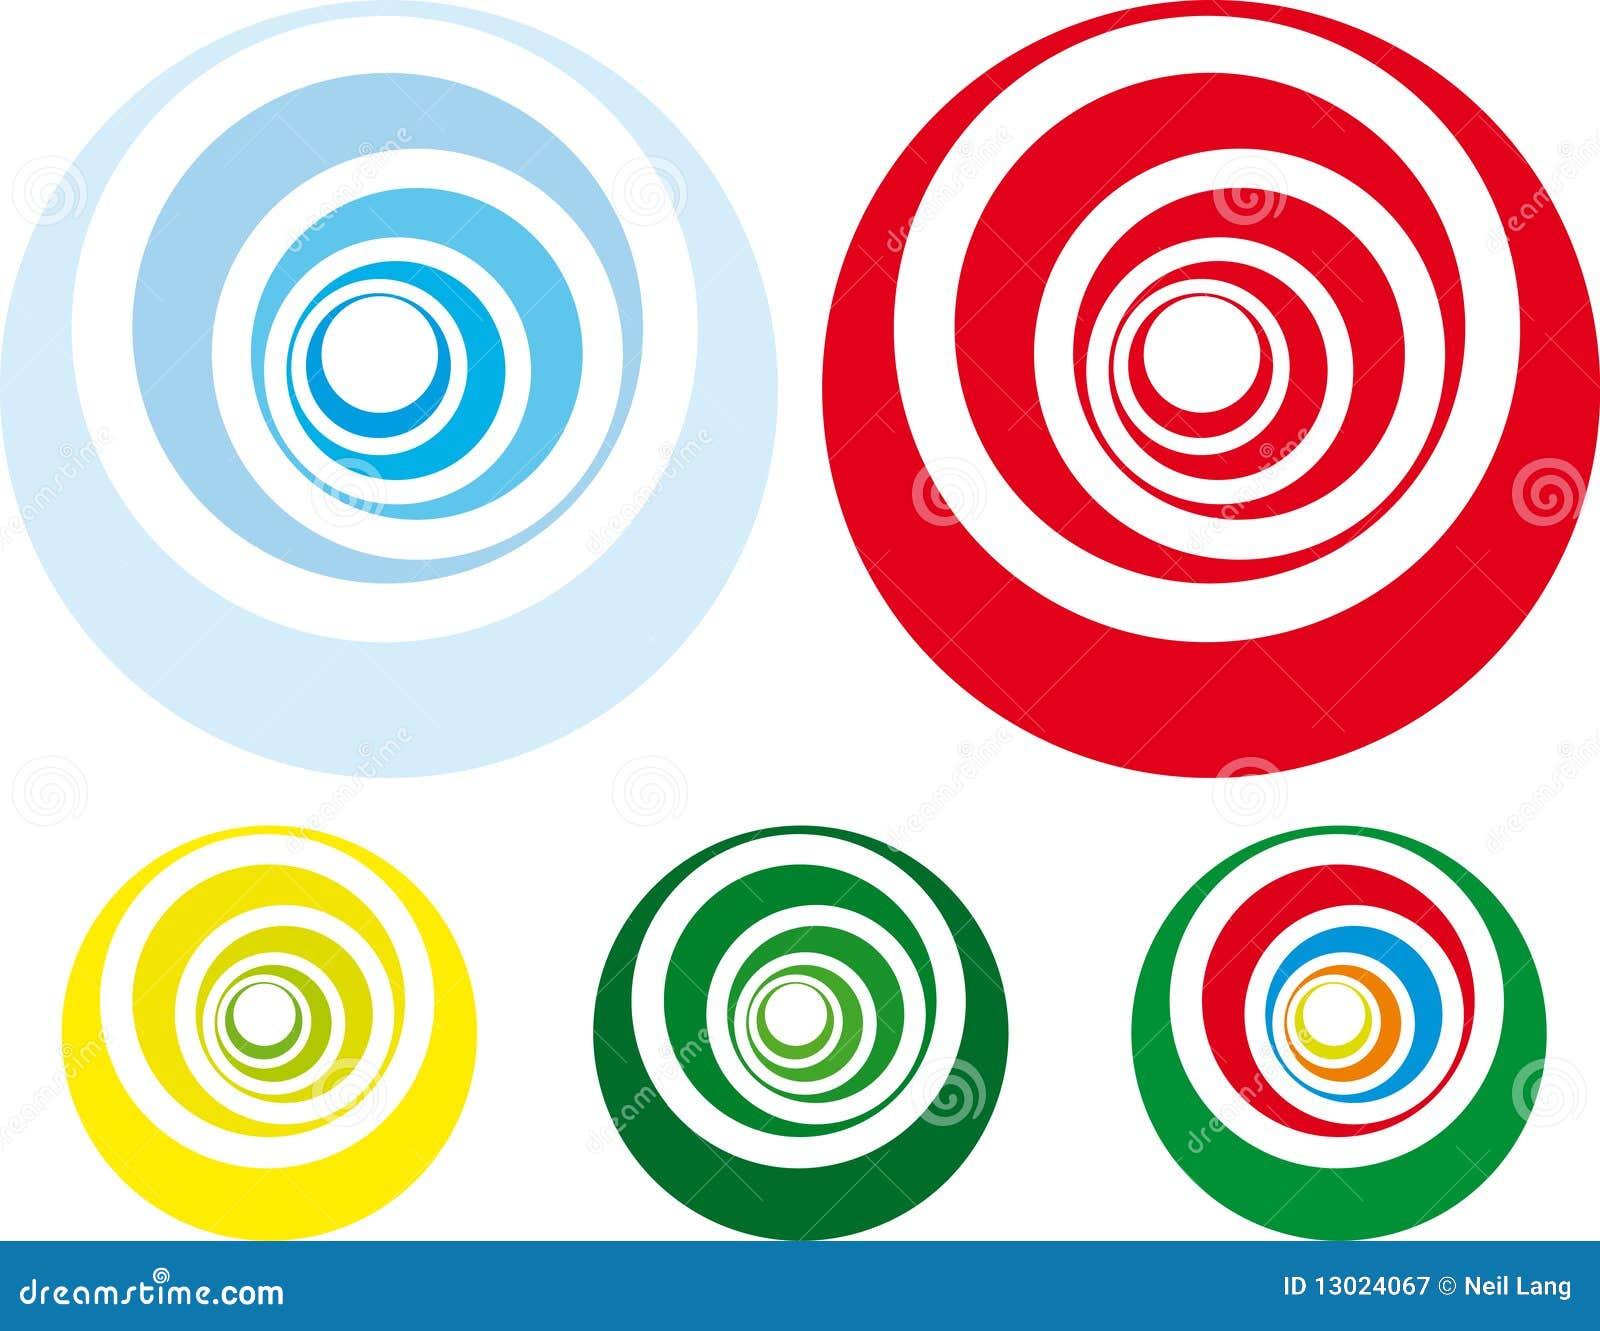 Retro styled spiral